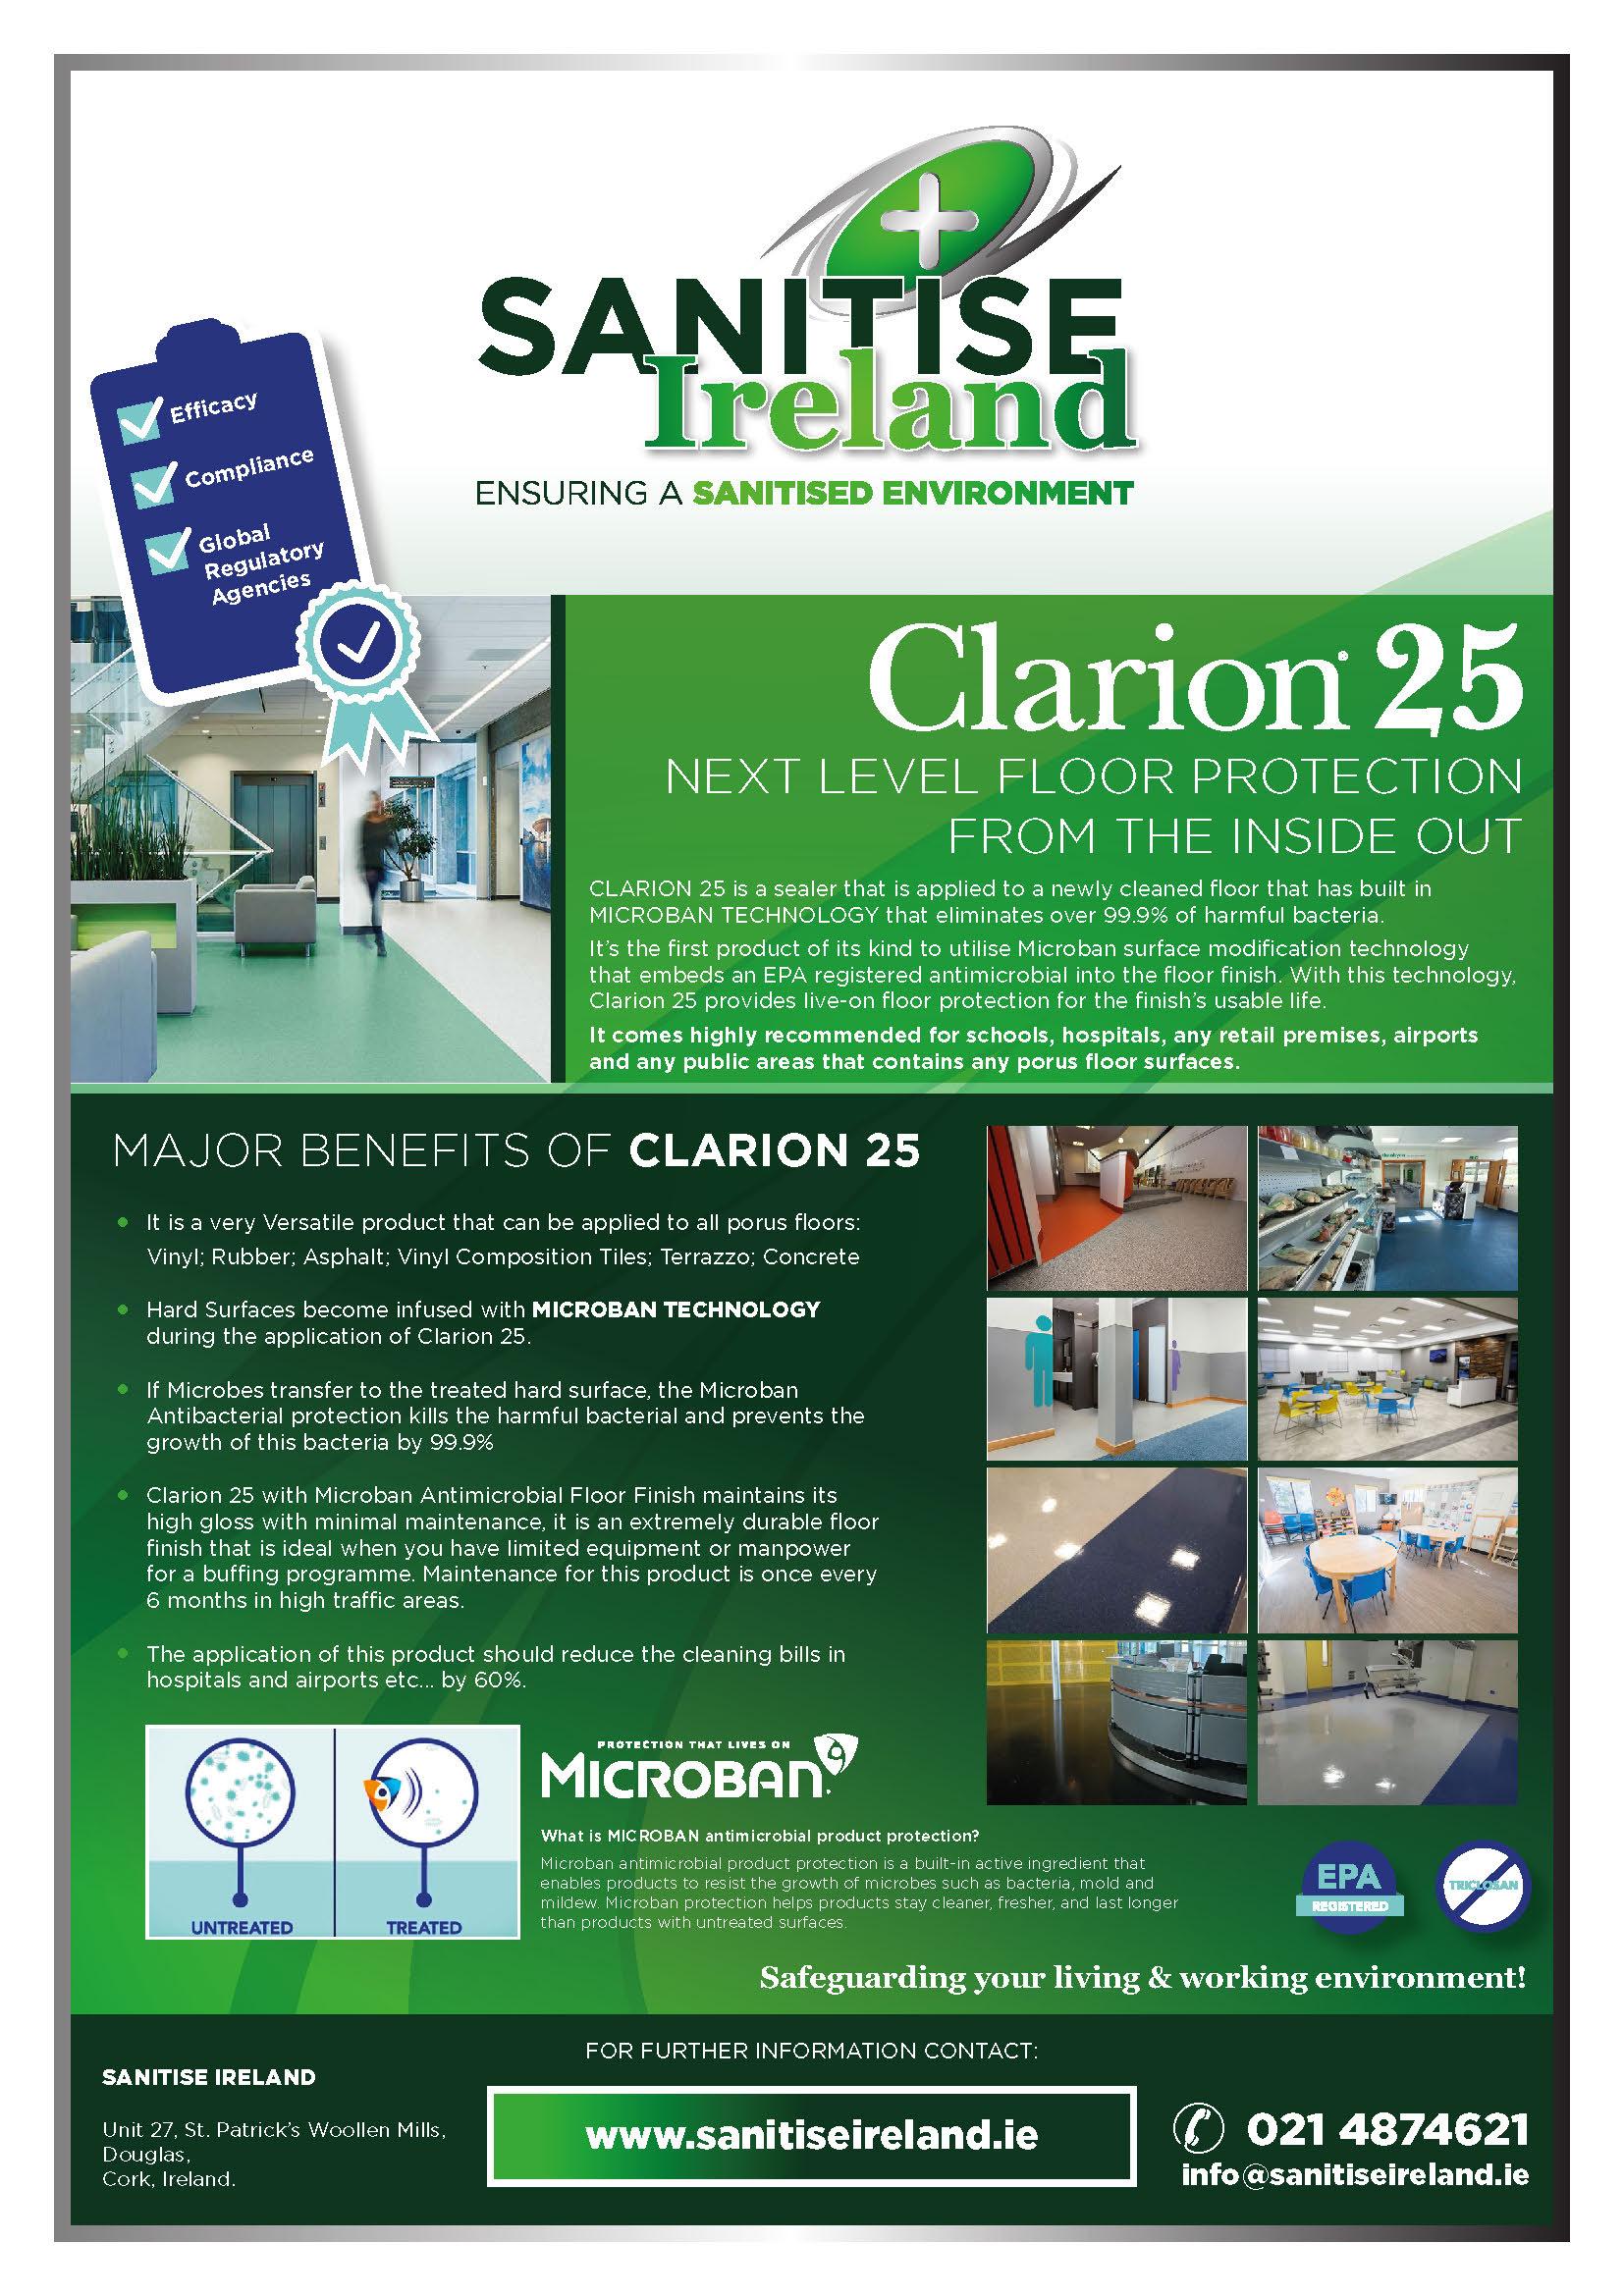 Santise Ireland - Clarion